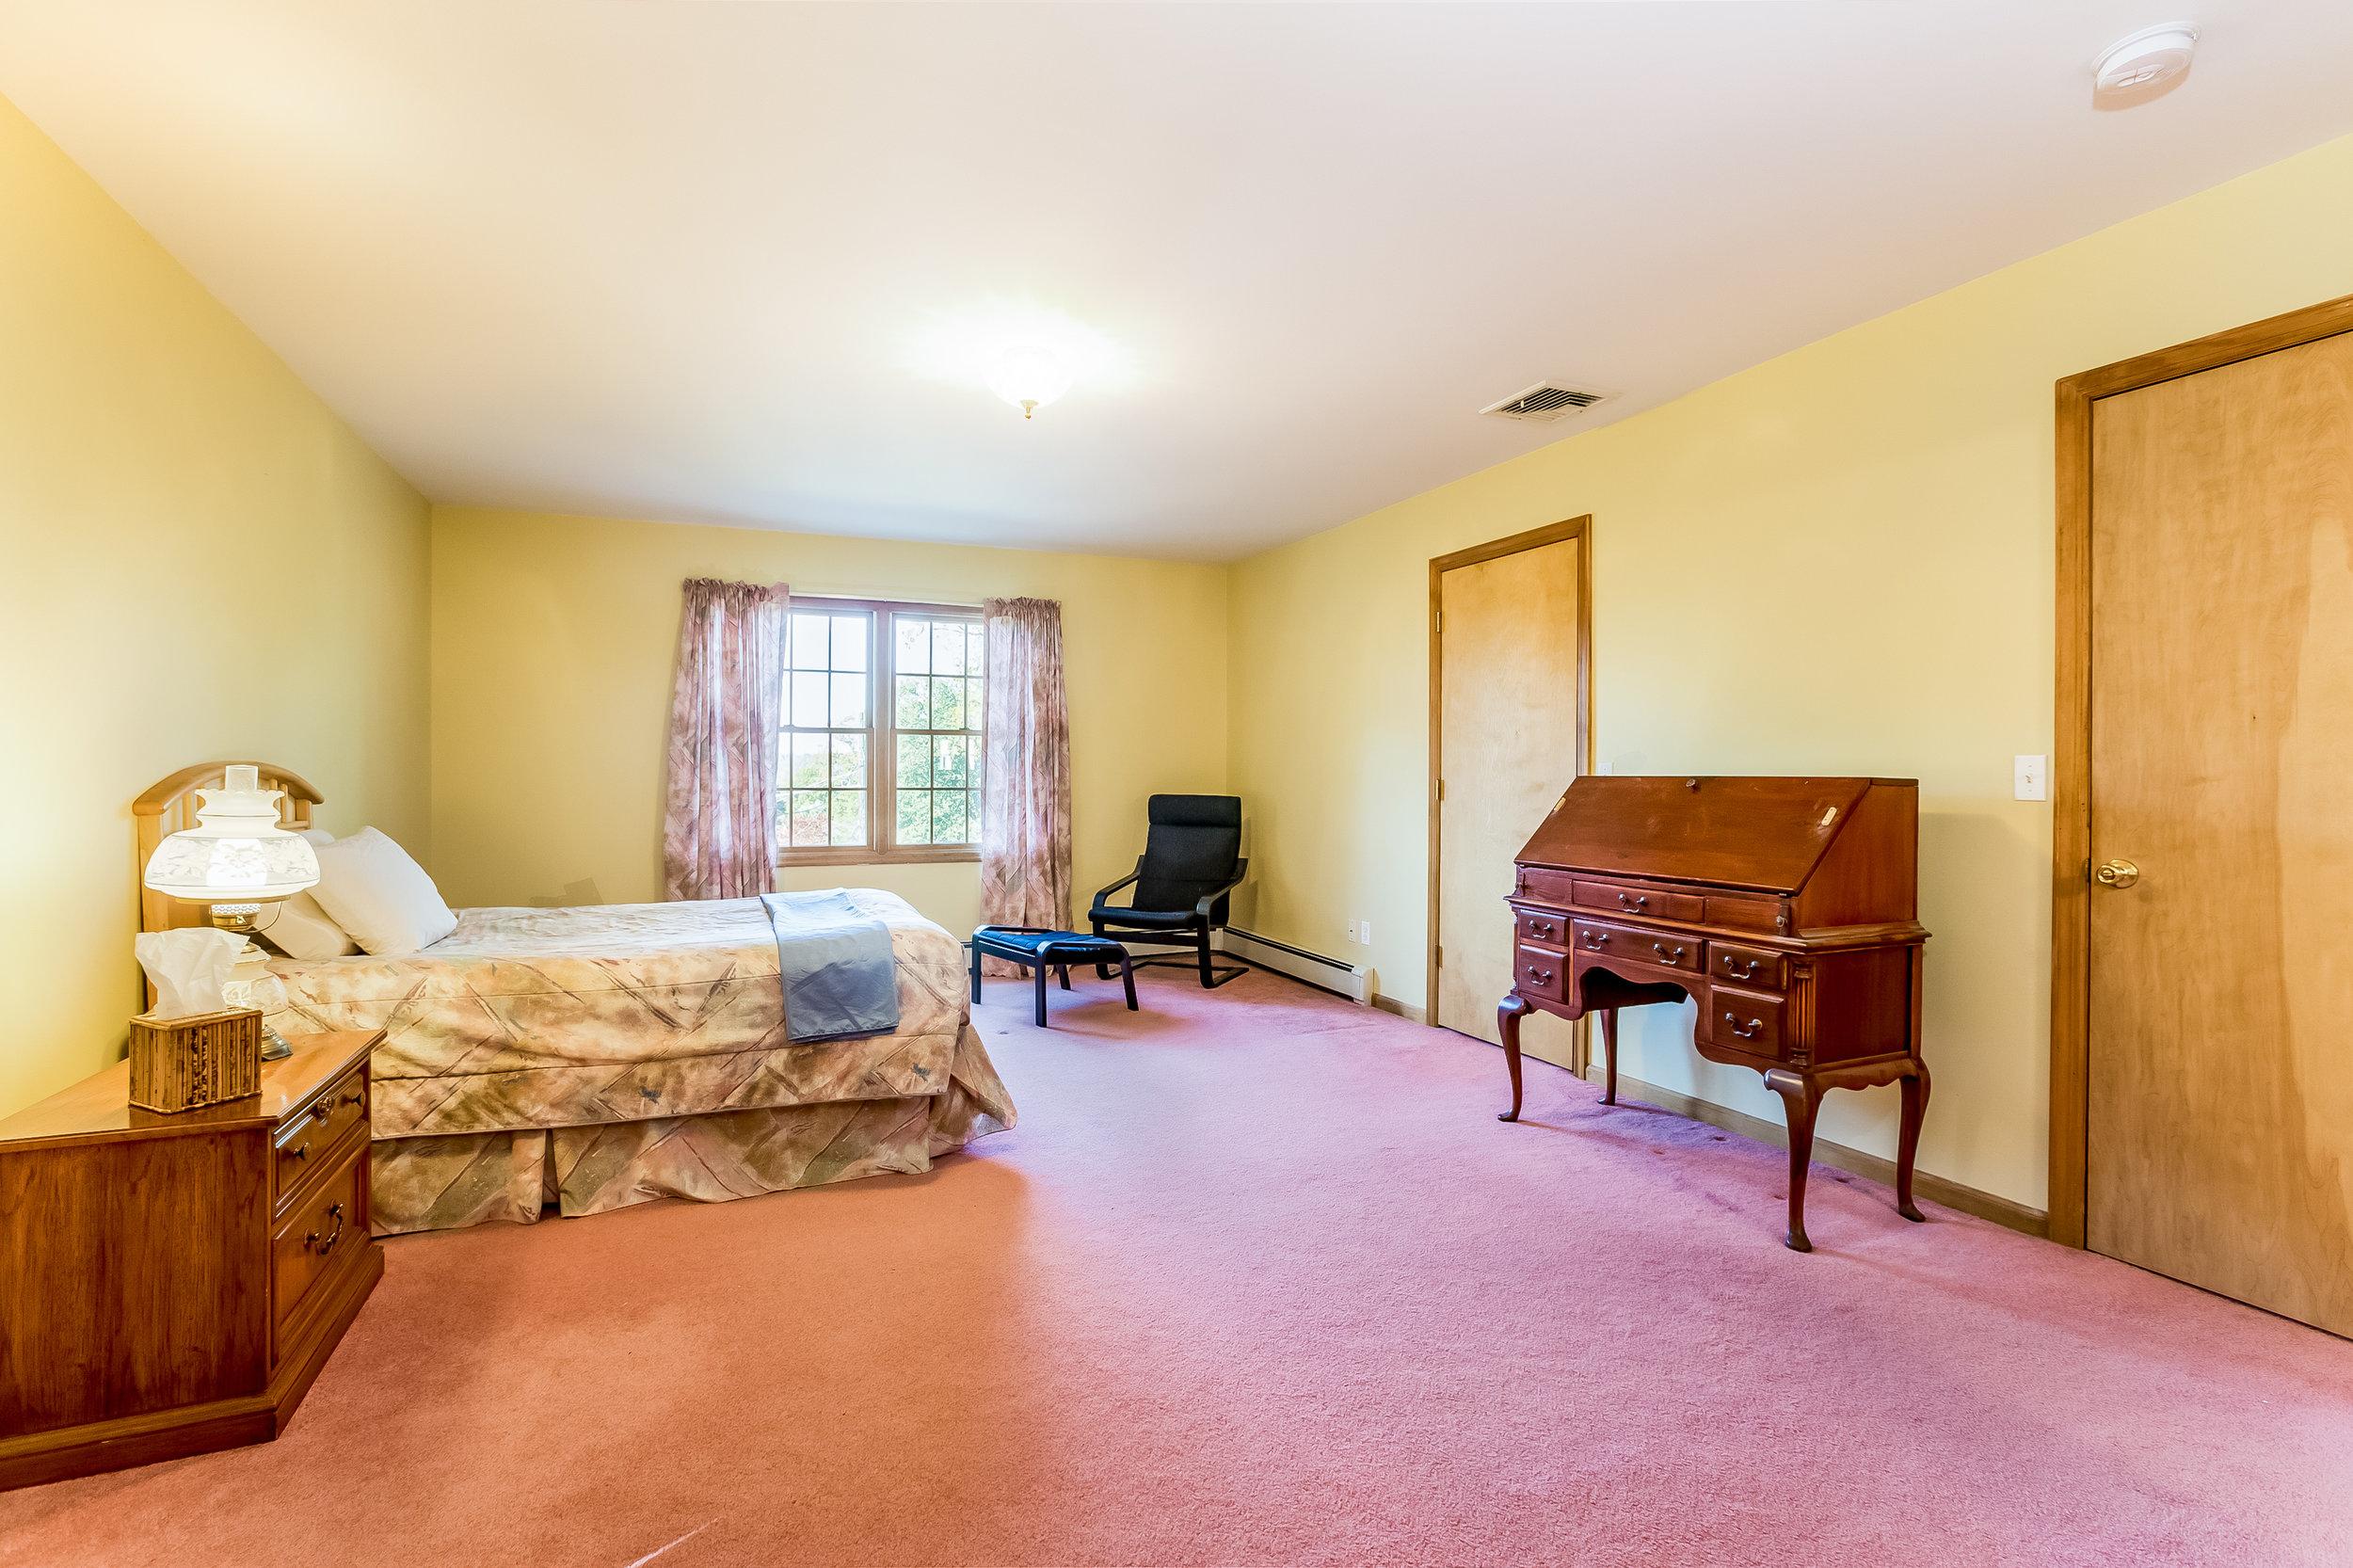 027-Master_Bedroom-5002166-large.jpg